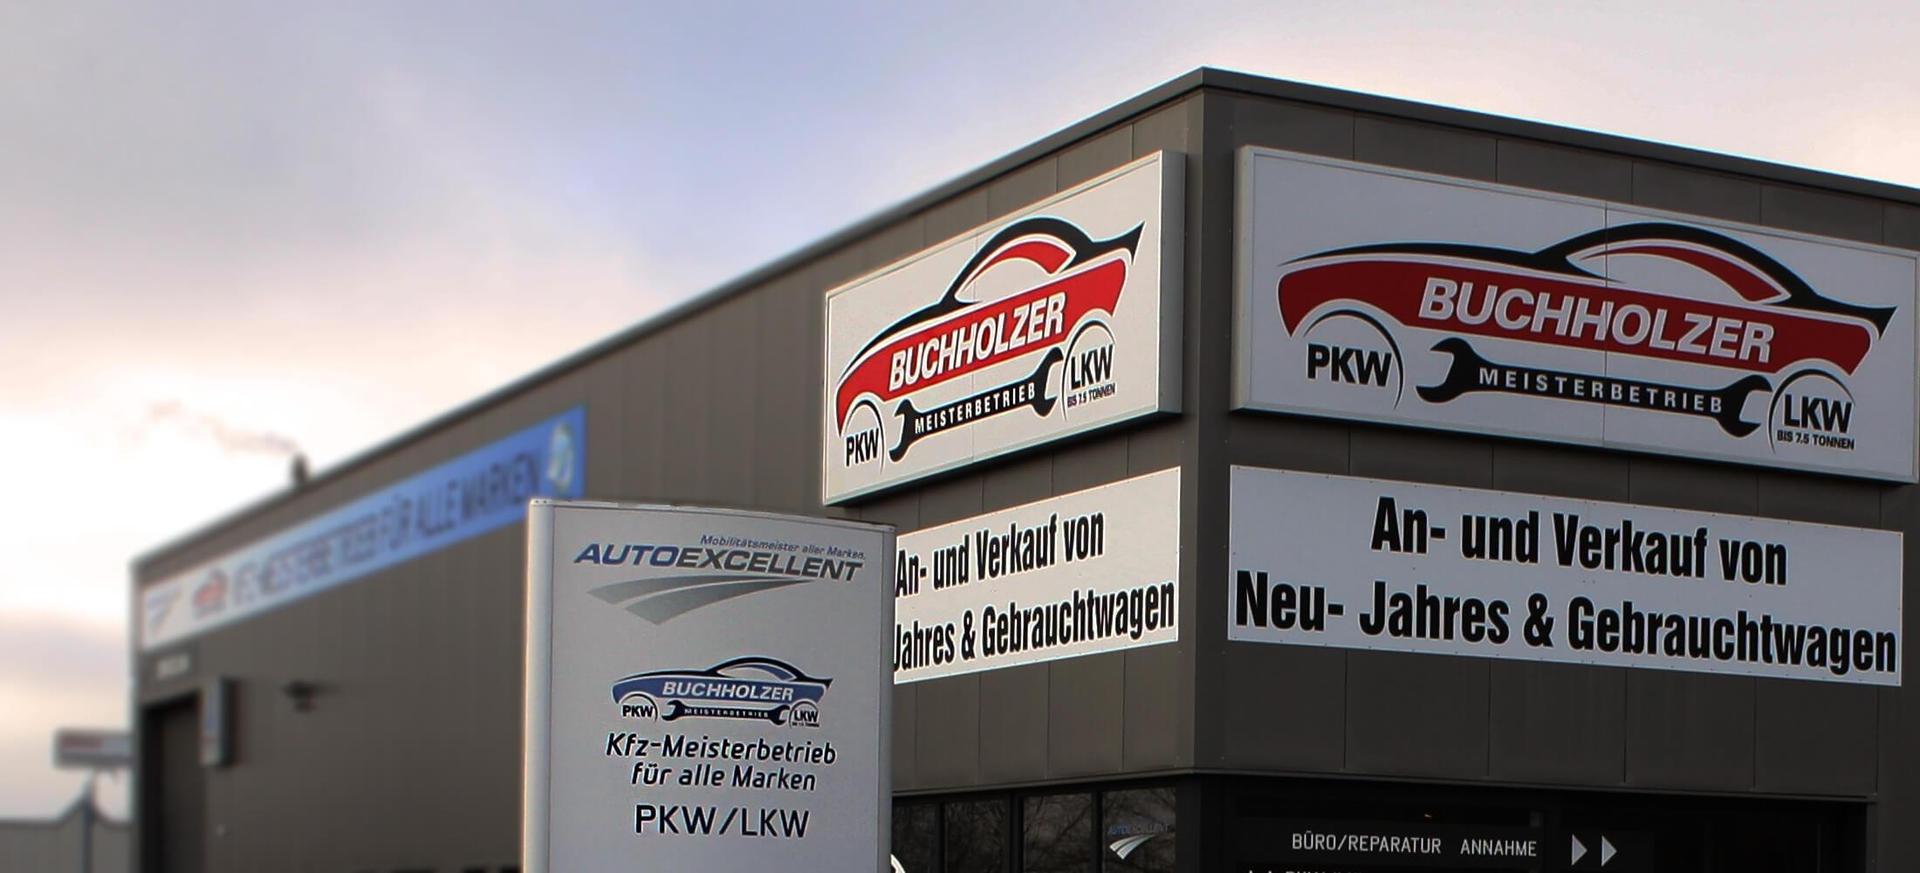 Autrado Lieferant - Buchholzer KFZ GmbH